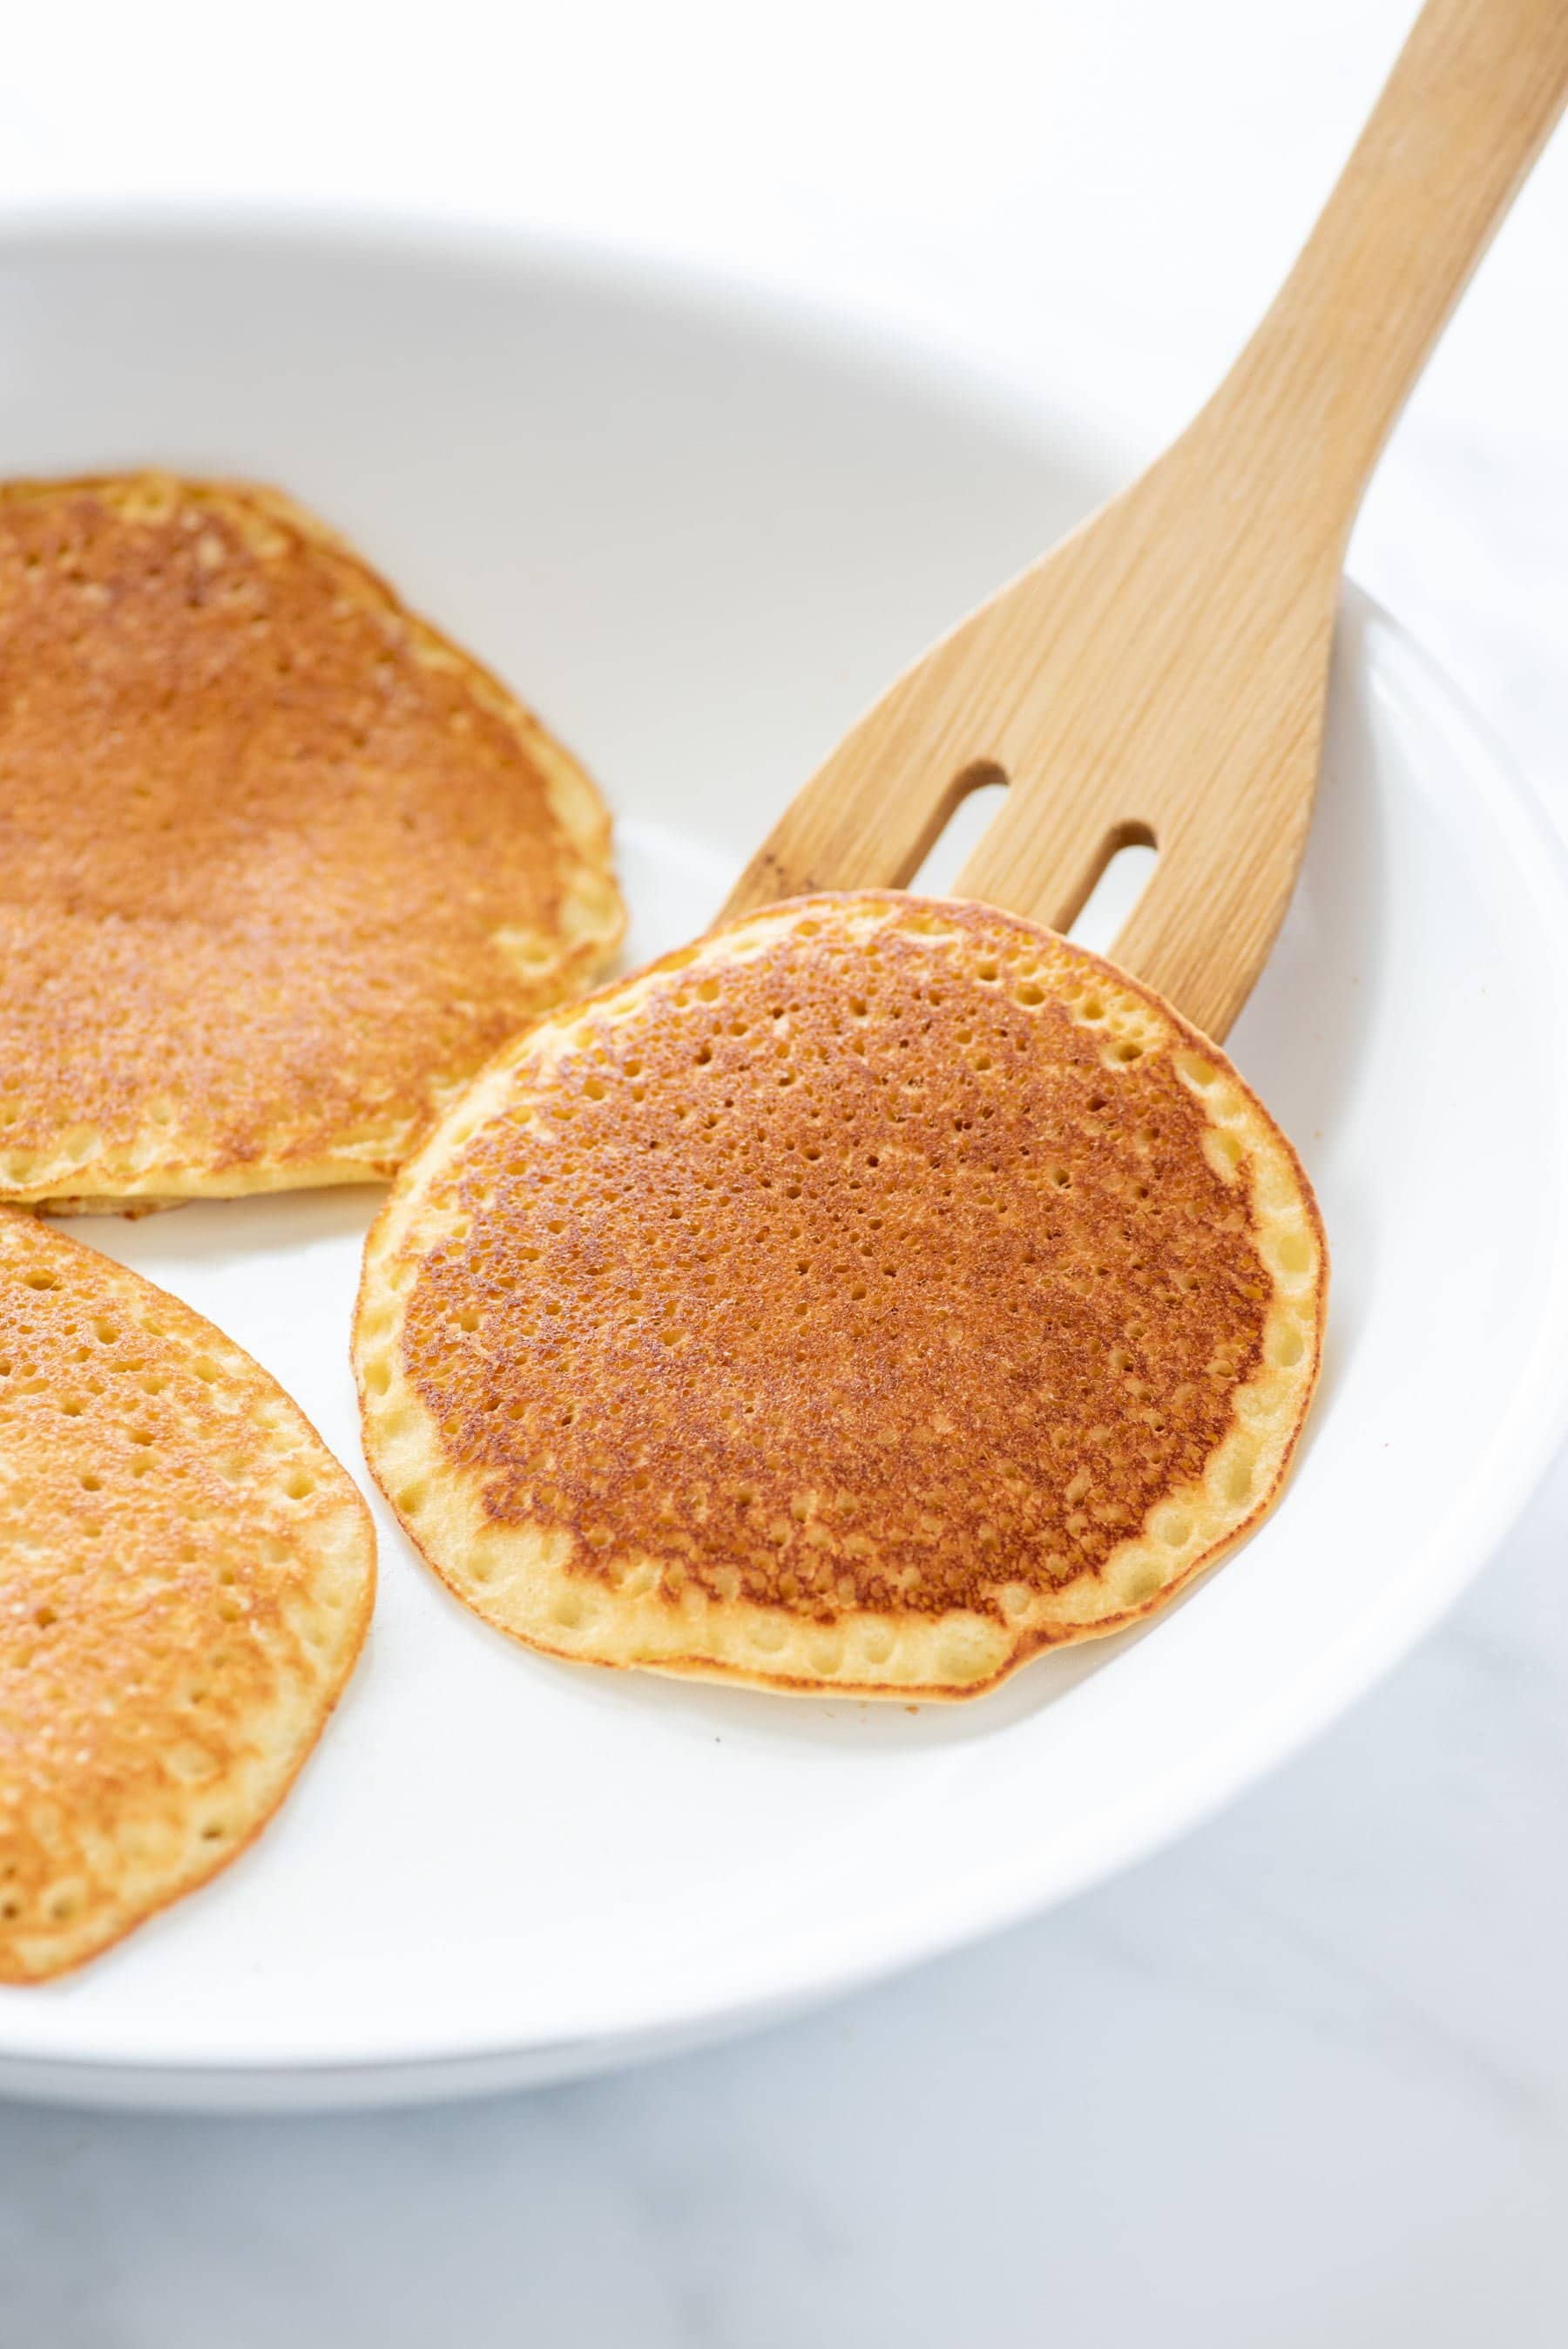 Side angle shot of a wooden spatula sliding a blender almond pancake onto a plate